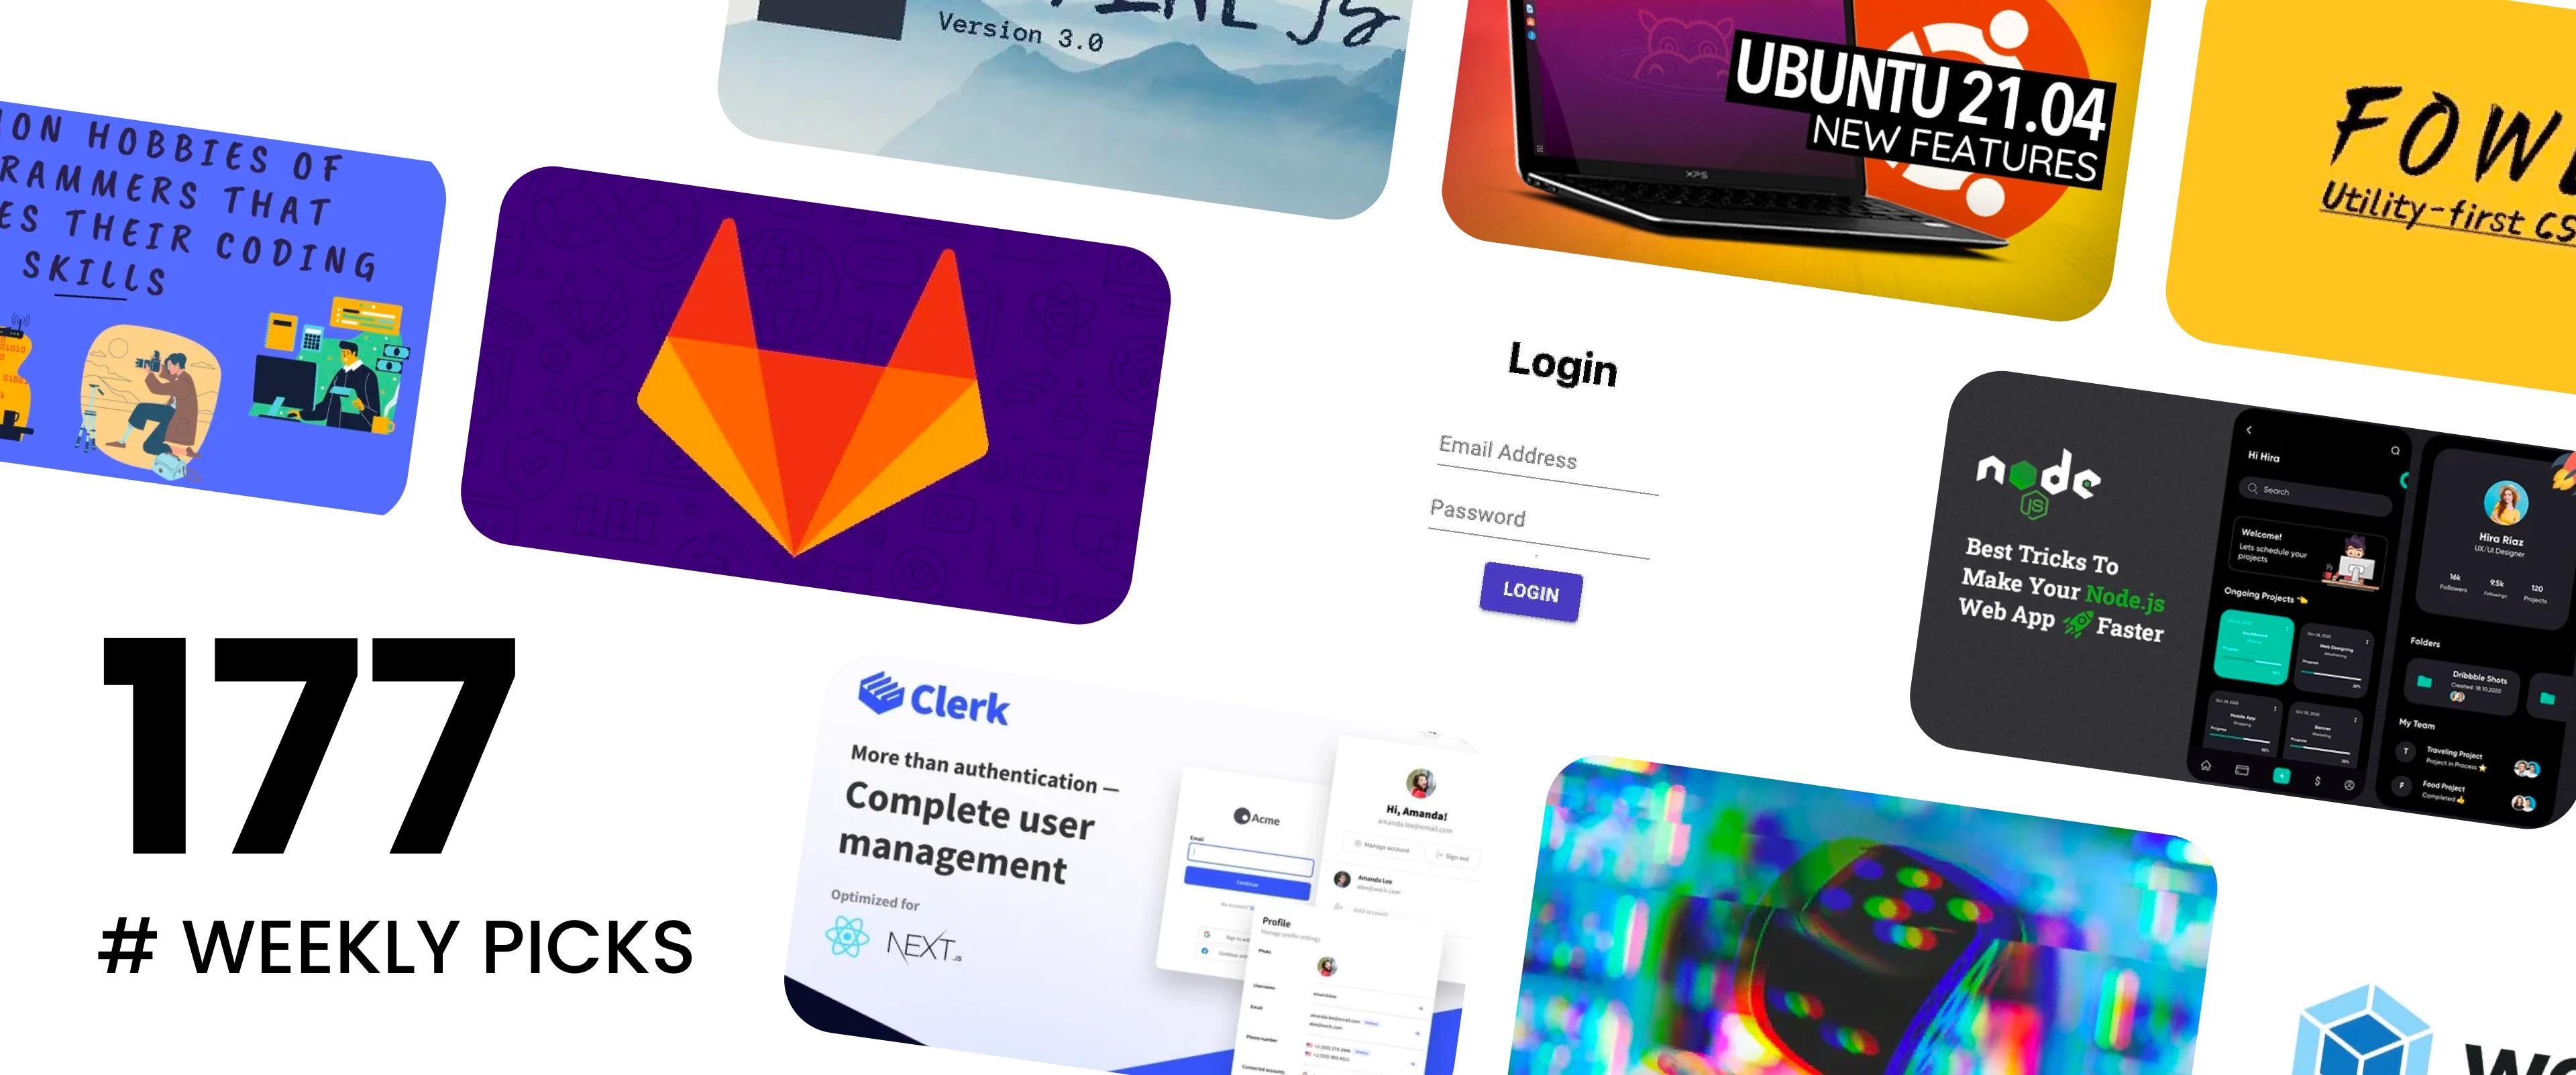 Alpine.js v3, Ubuntu 21.04, Fower v1 - Picks #177